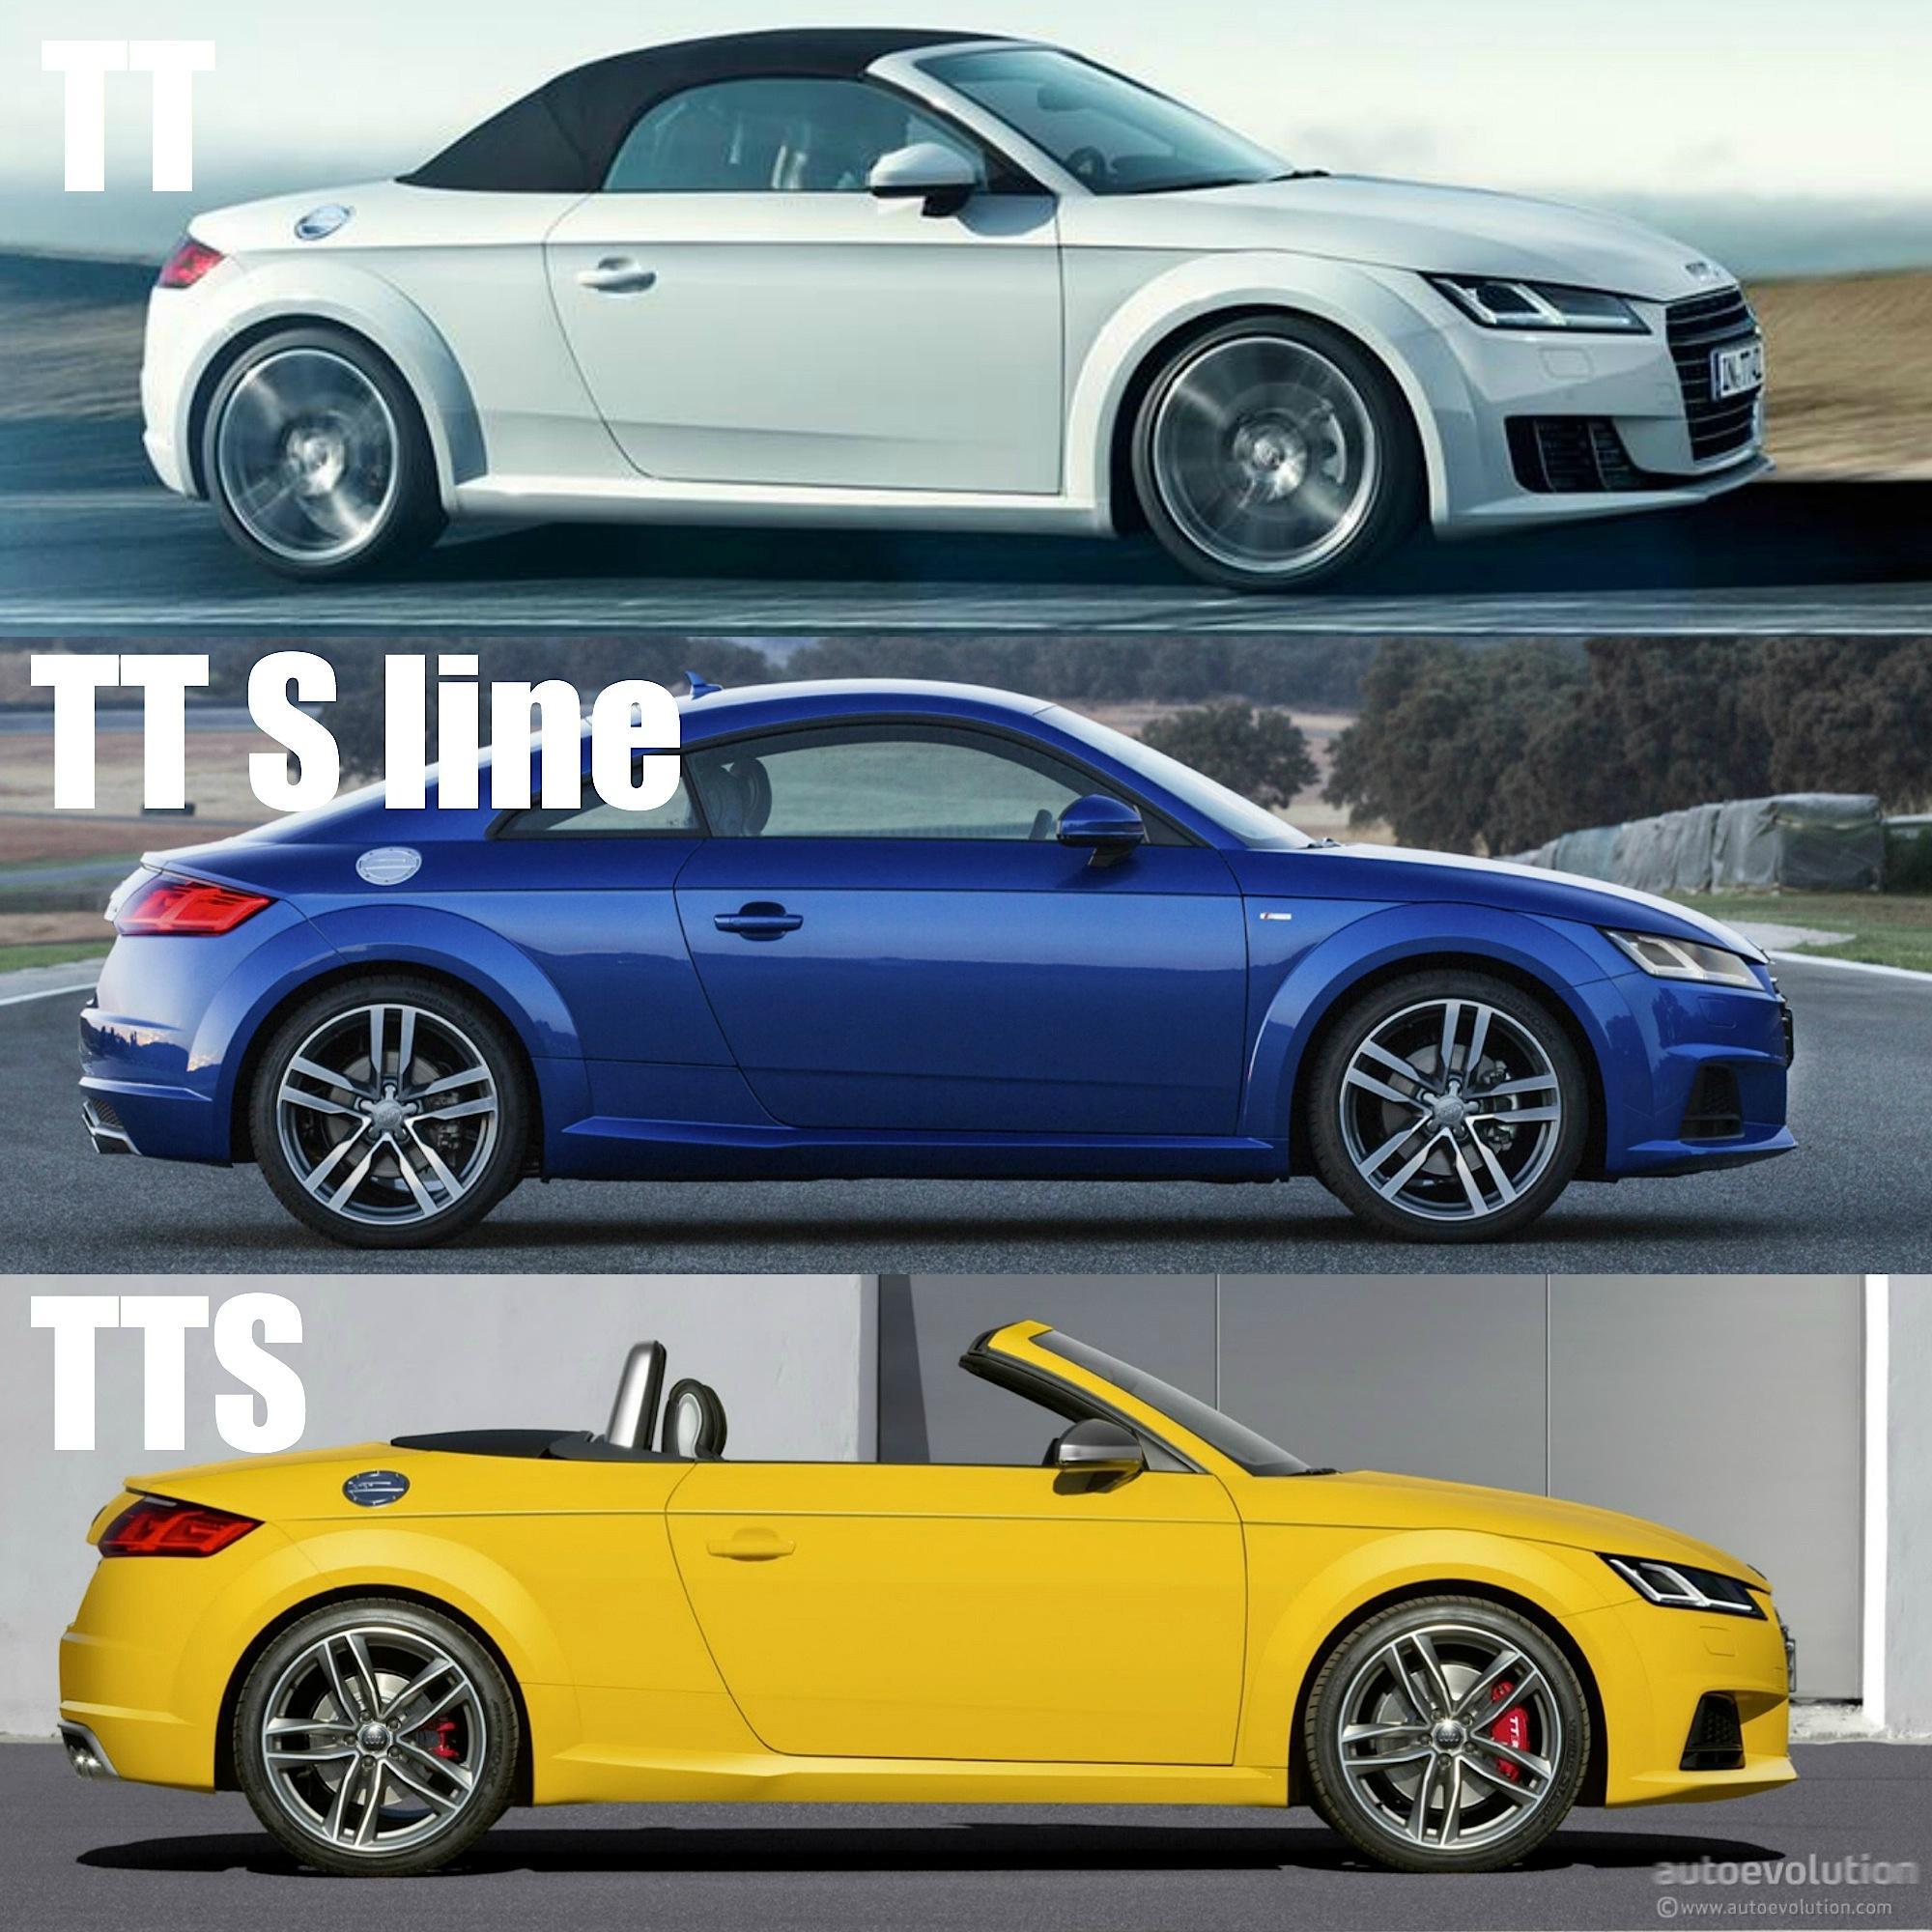 2015 Audi TT, TT S Line And TTS: How To Tell Them Apart